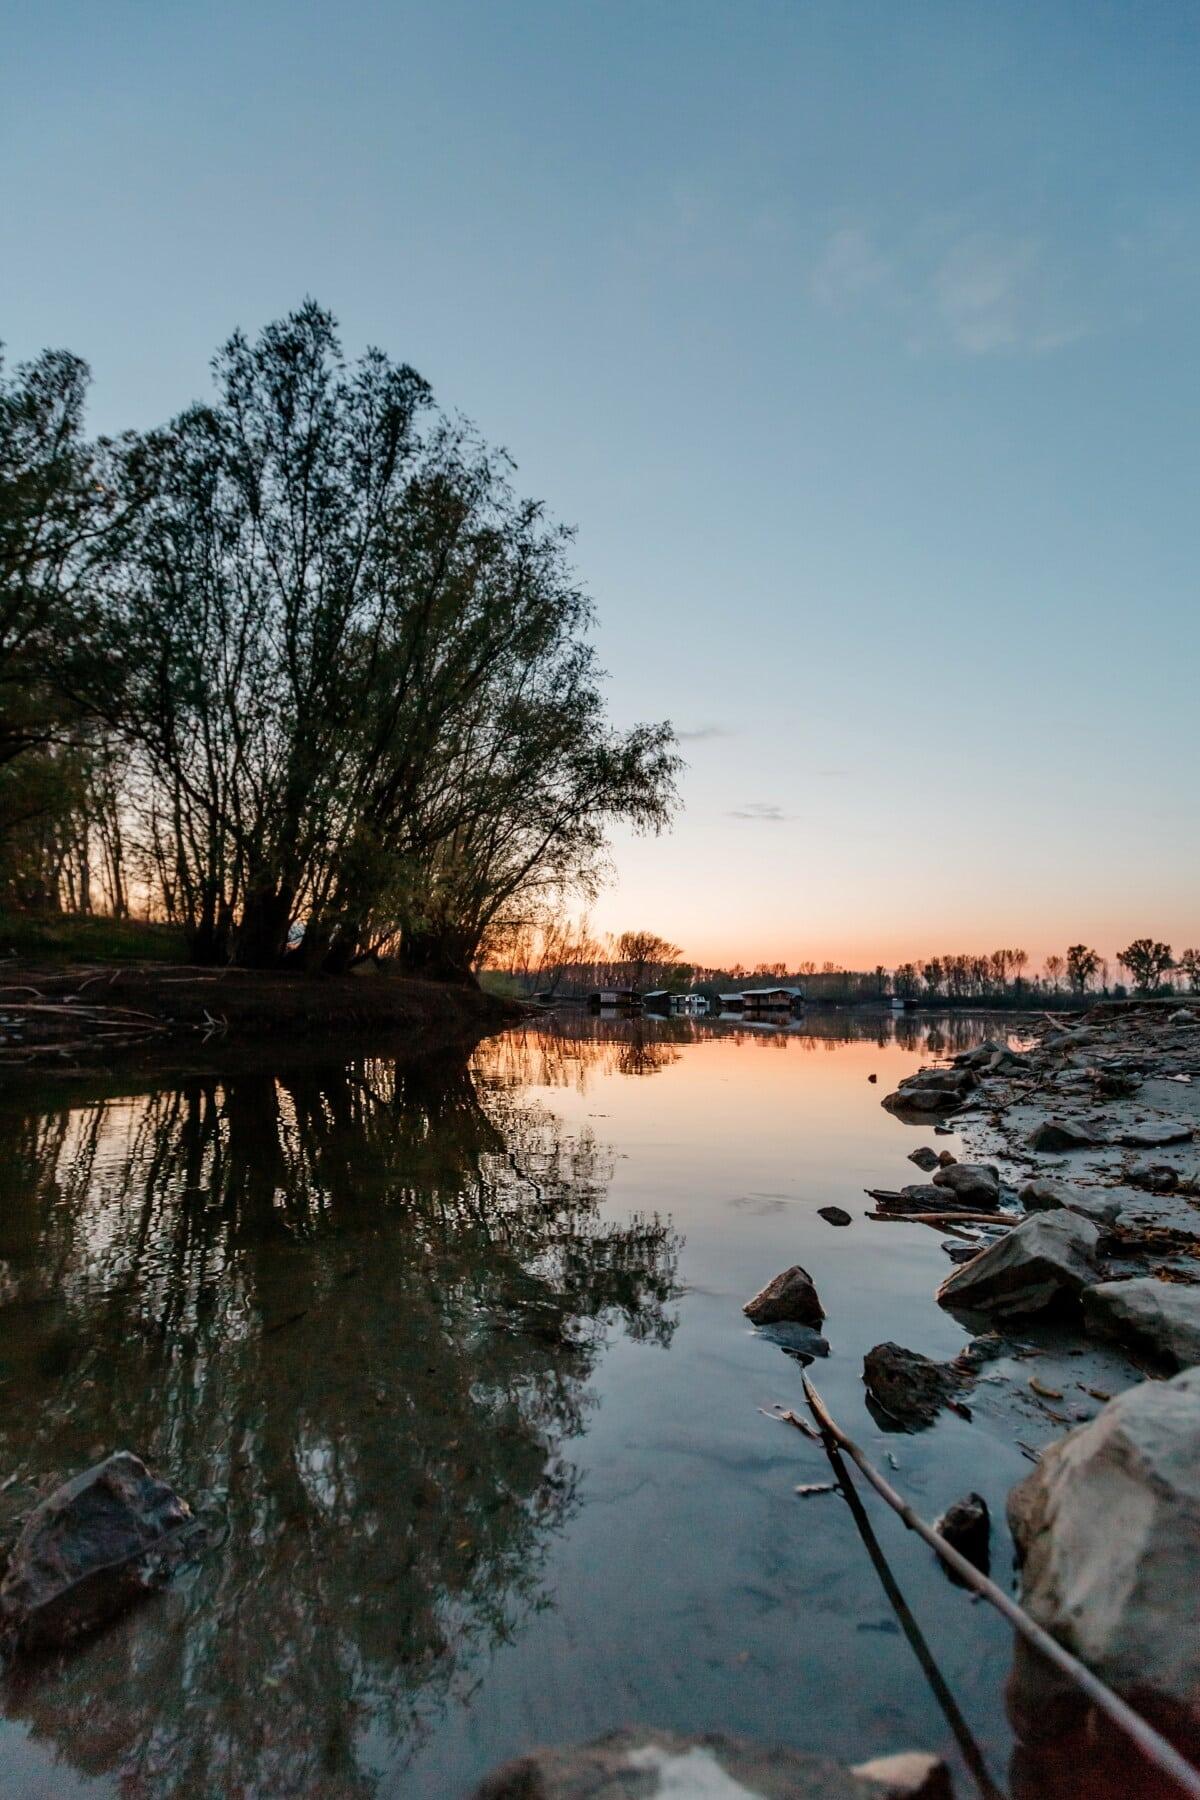 See, am See, Landschaft, Ufer, Wasser, Struktur, Natur, Fluss, Reflexion, Dämmerung